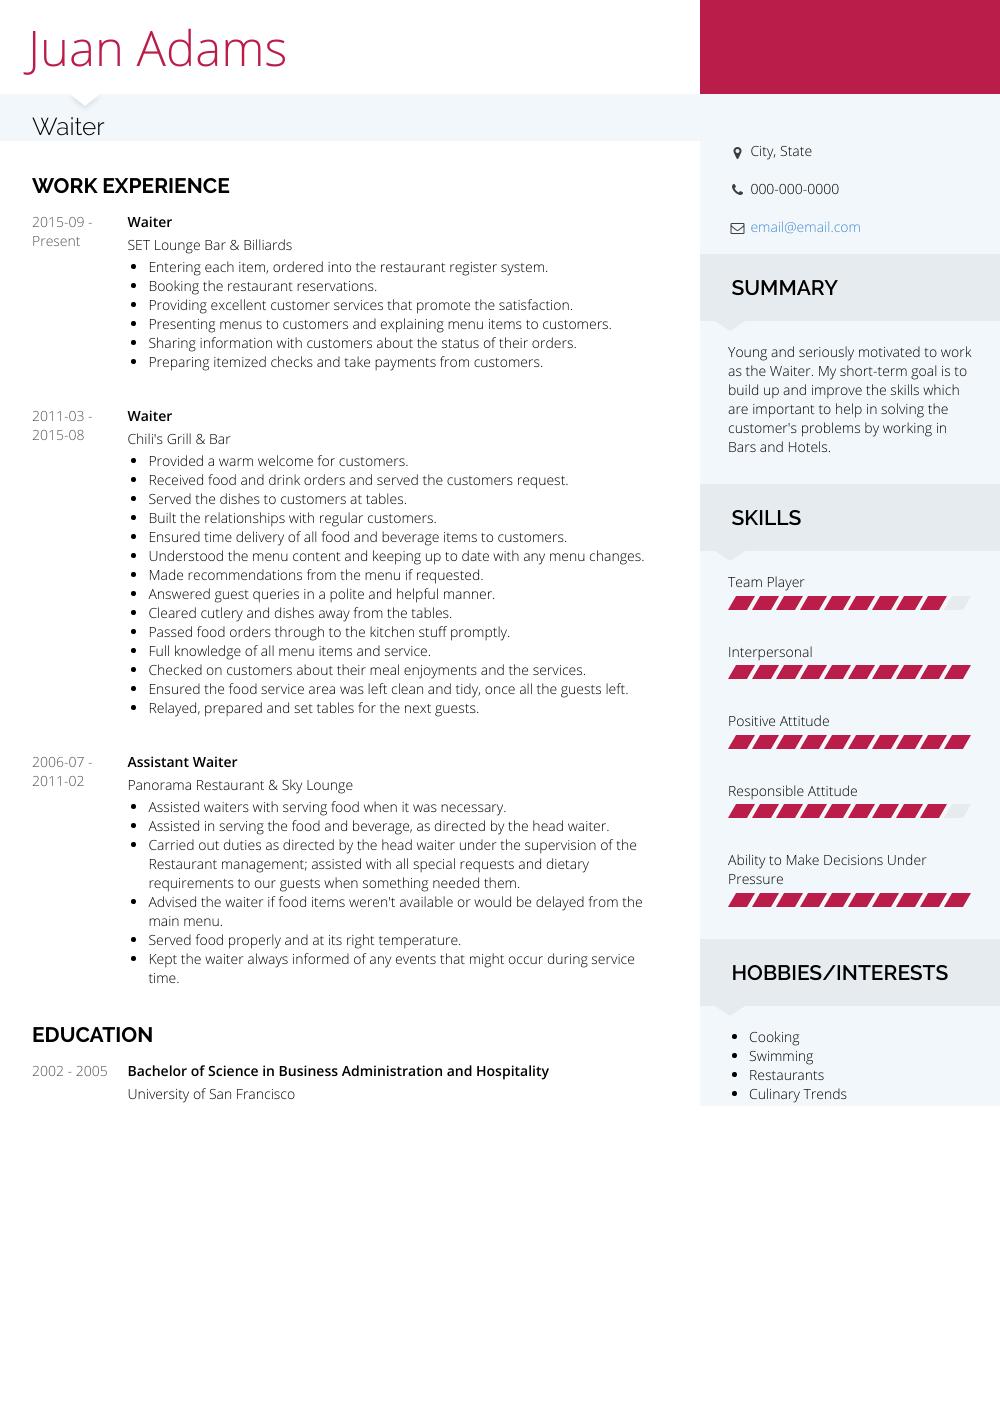 Waiter  Resume Samples and Templates  VisualCV